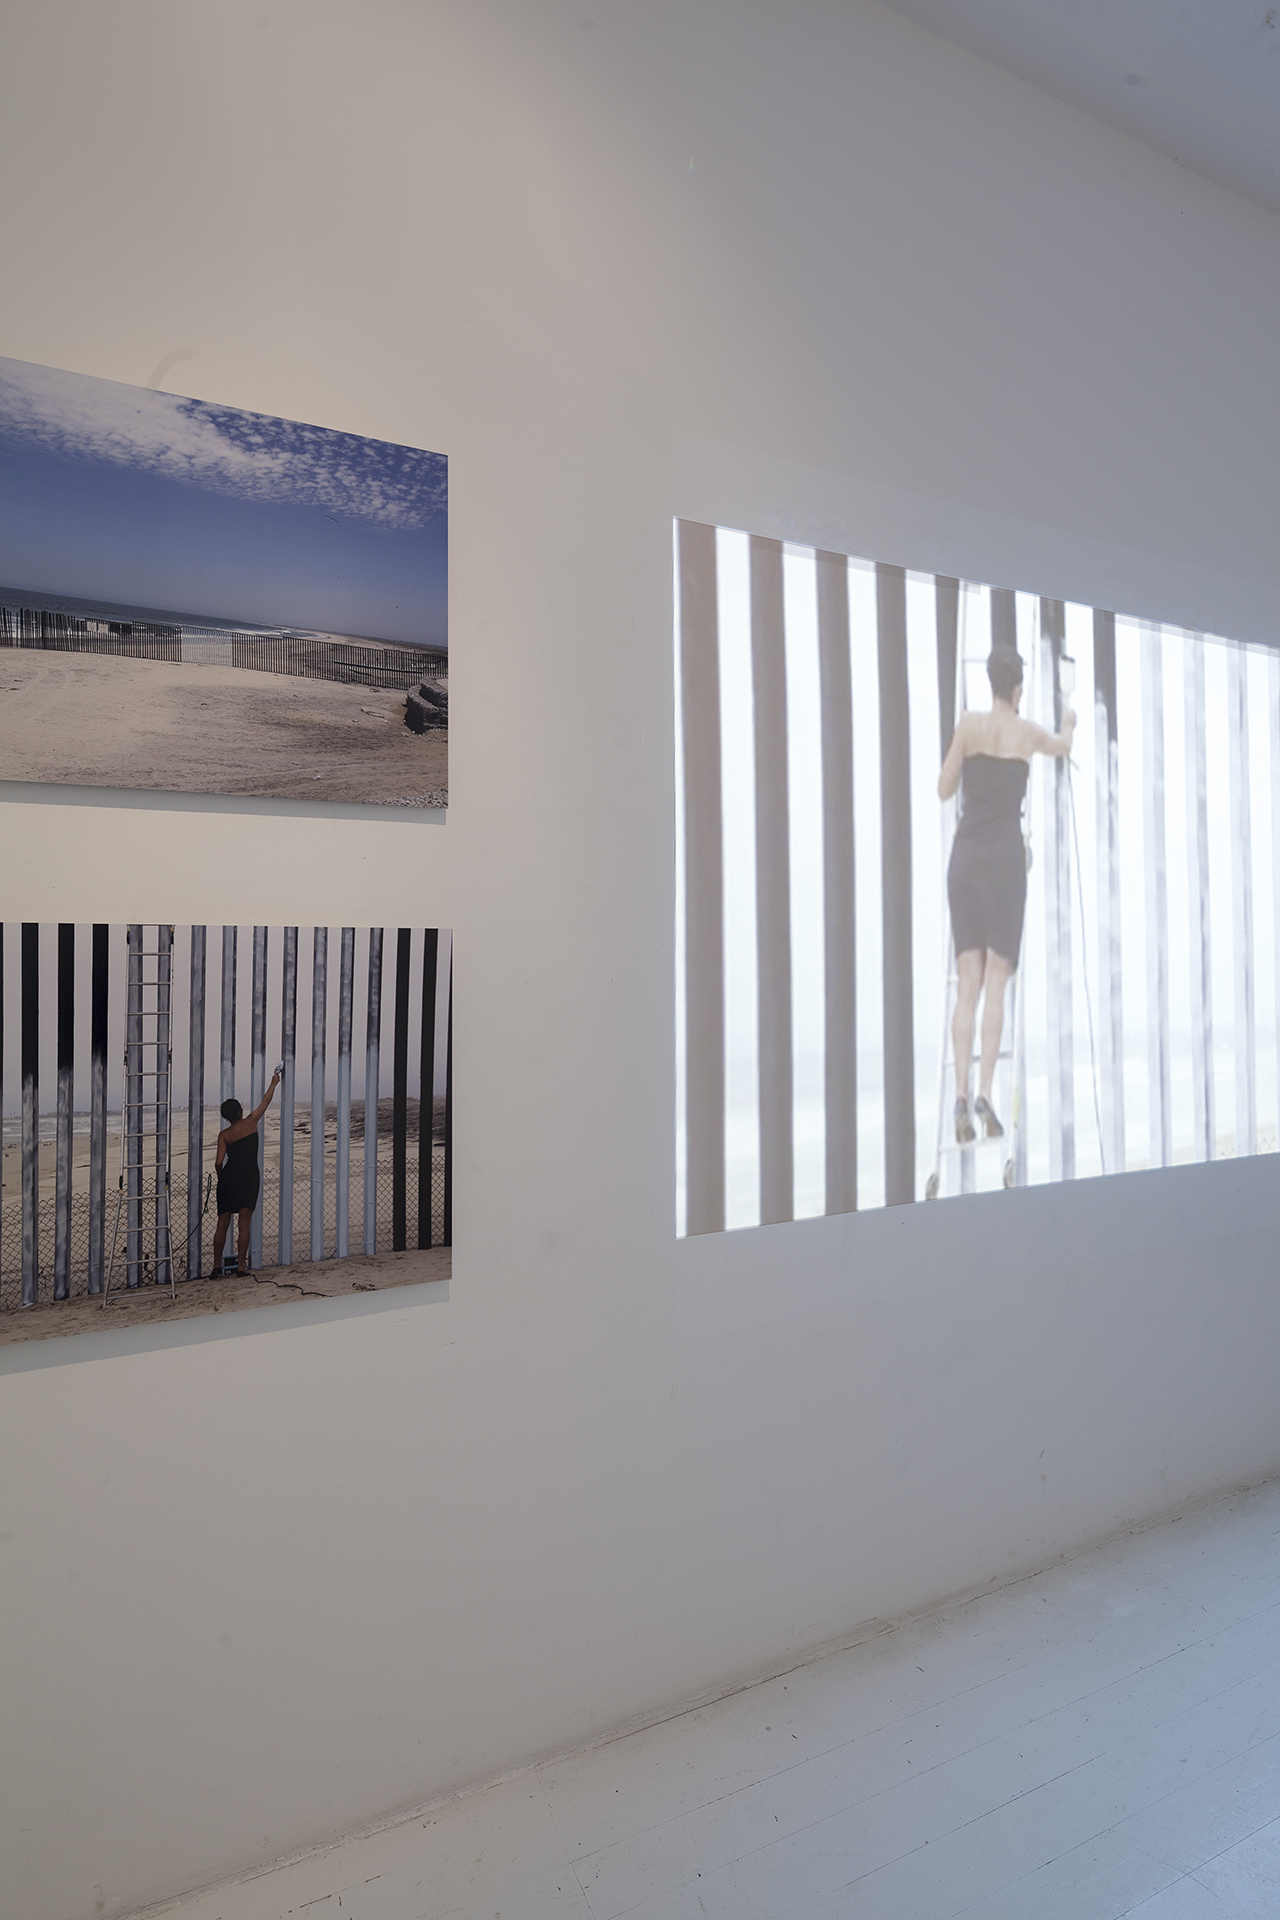 Hinterland GRENZ ERFAHRUNG_Ana Teresa Fernandez Borrando la frontera 2015 copyright Jakob Winkler hinterland.jpg